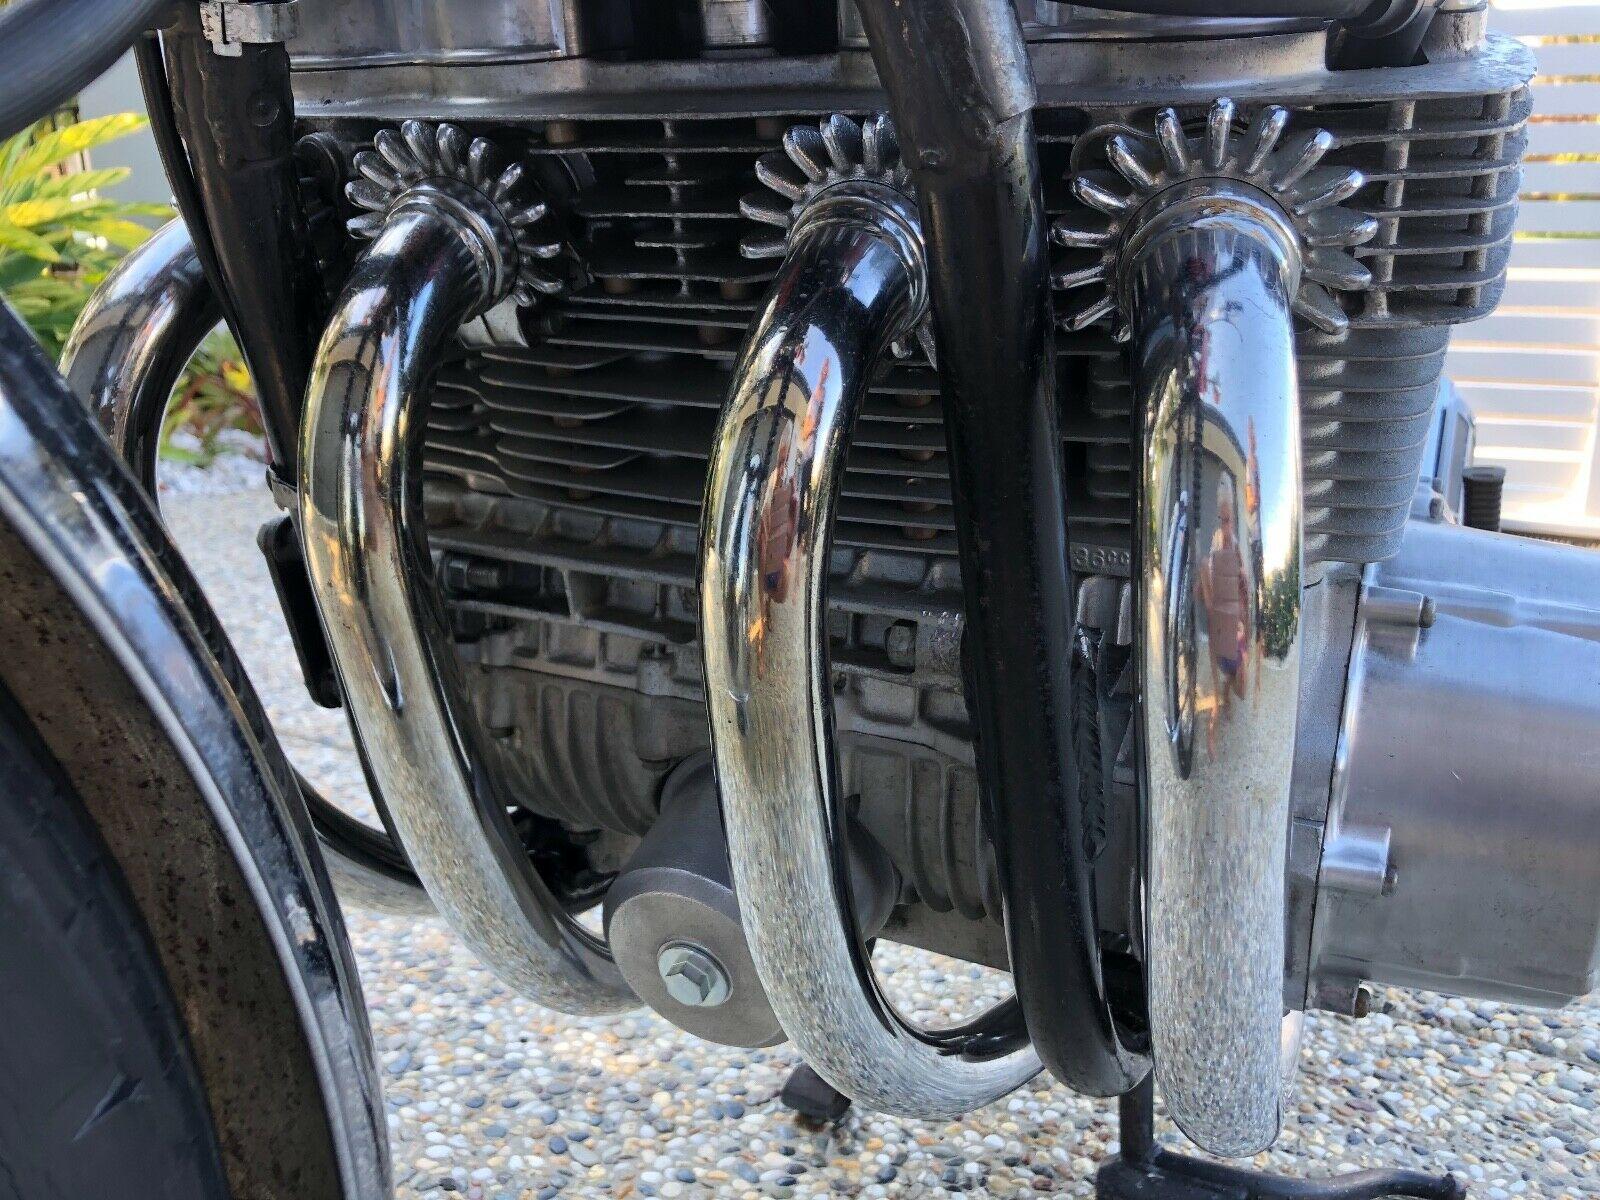 1969 Honda CB750 Sandcast K0 engine pipes